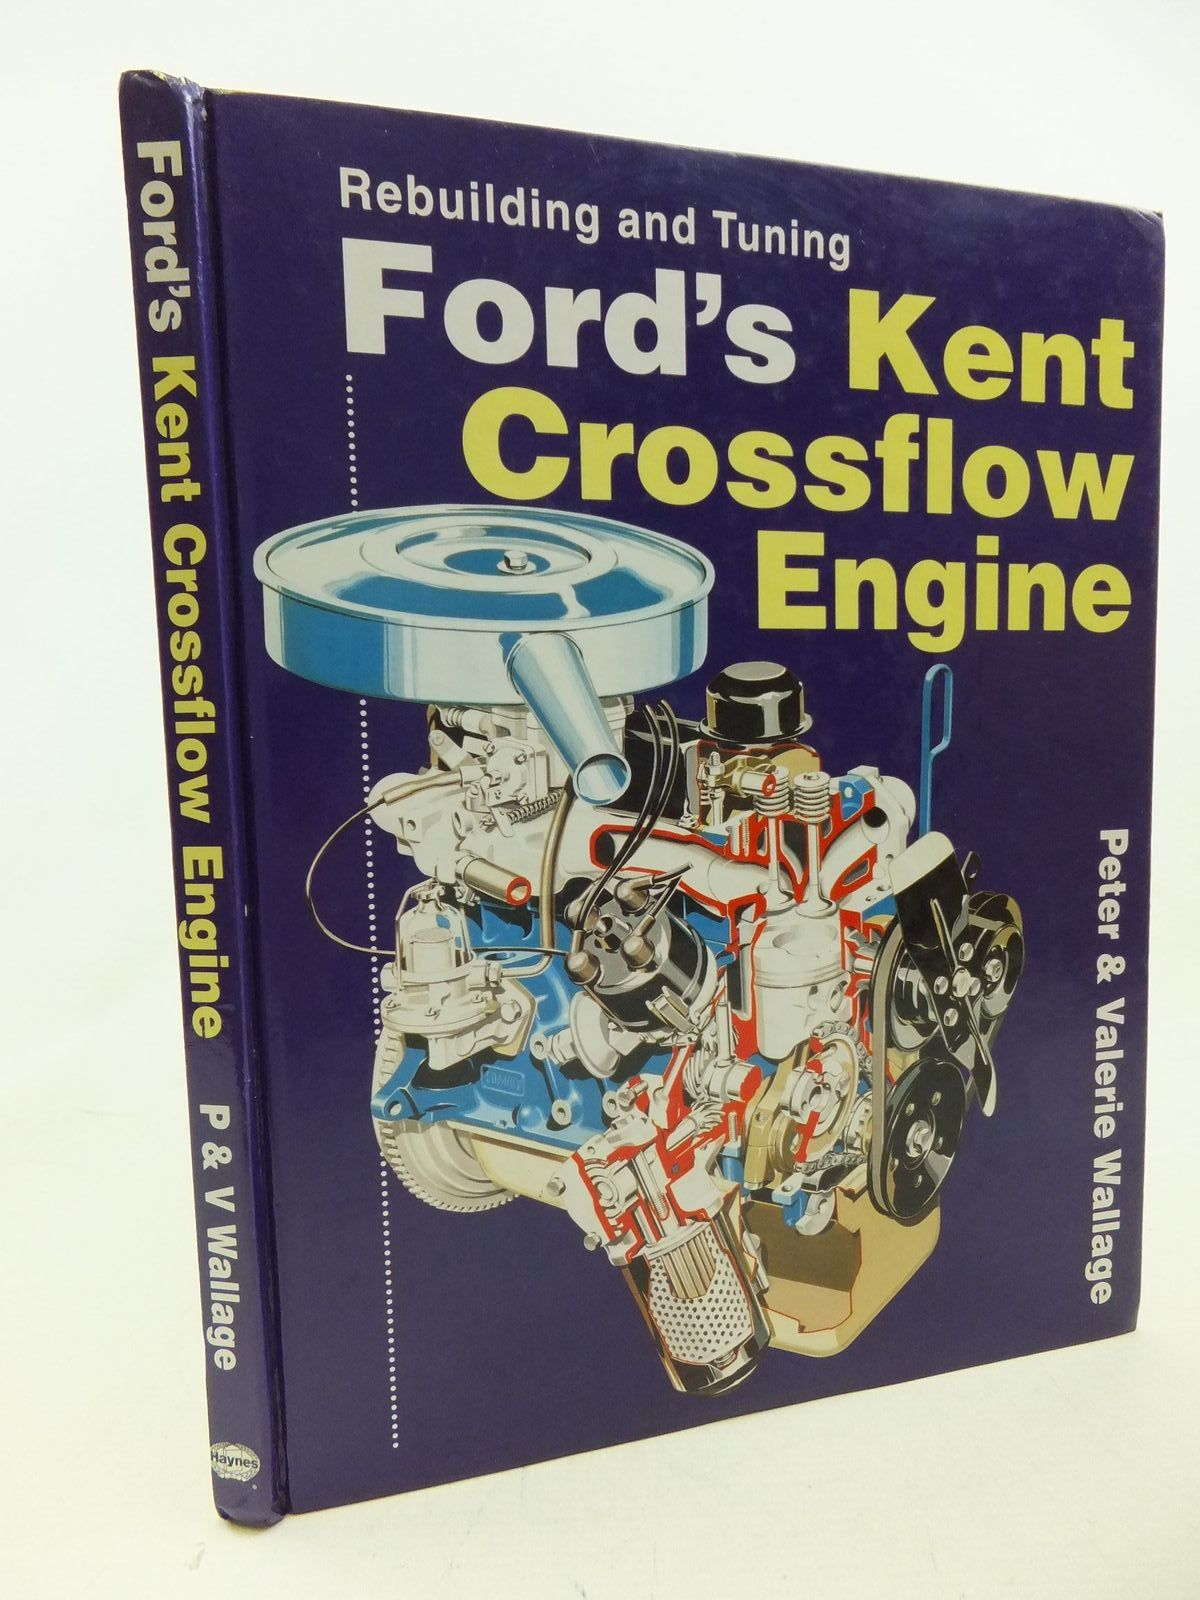 rebuilding and tuning ford s kent crossflow engine written by rh stellabooks com Engine Overhaul Procedure Banshee Engine Overhaul